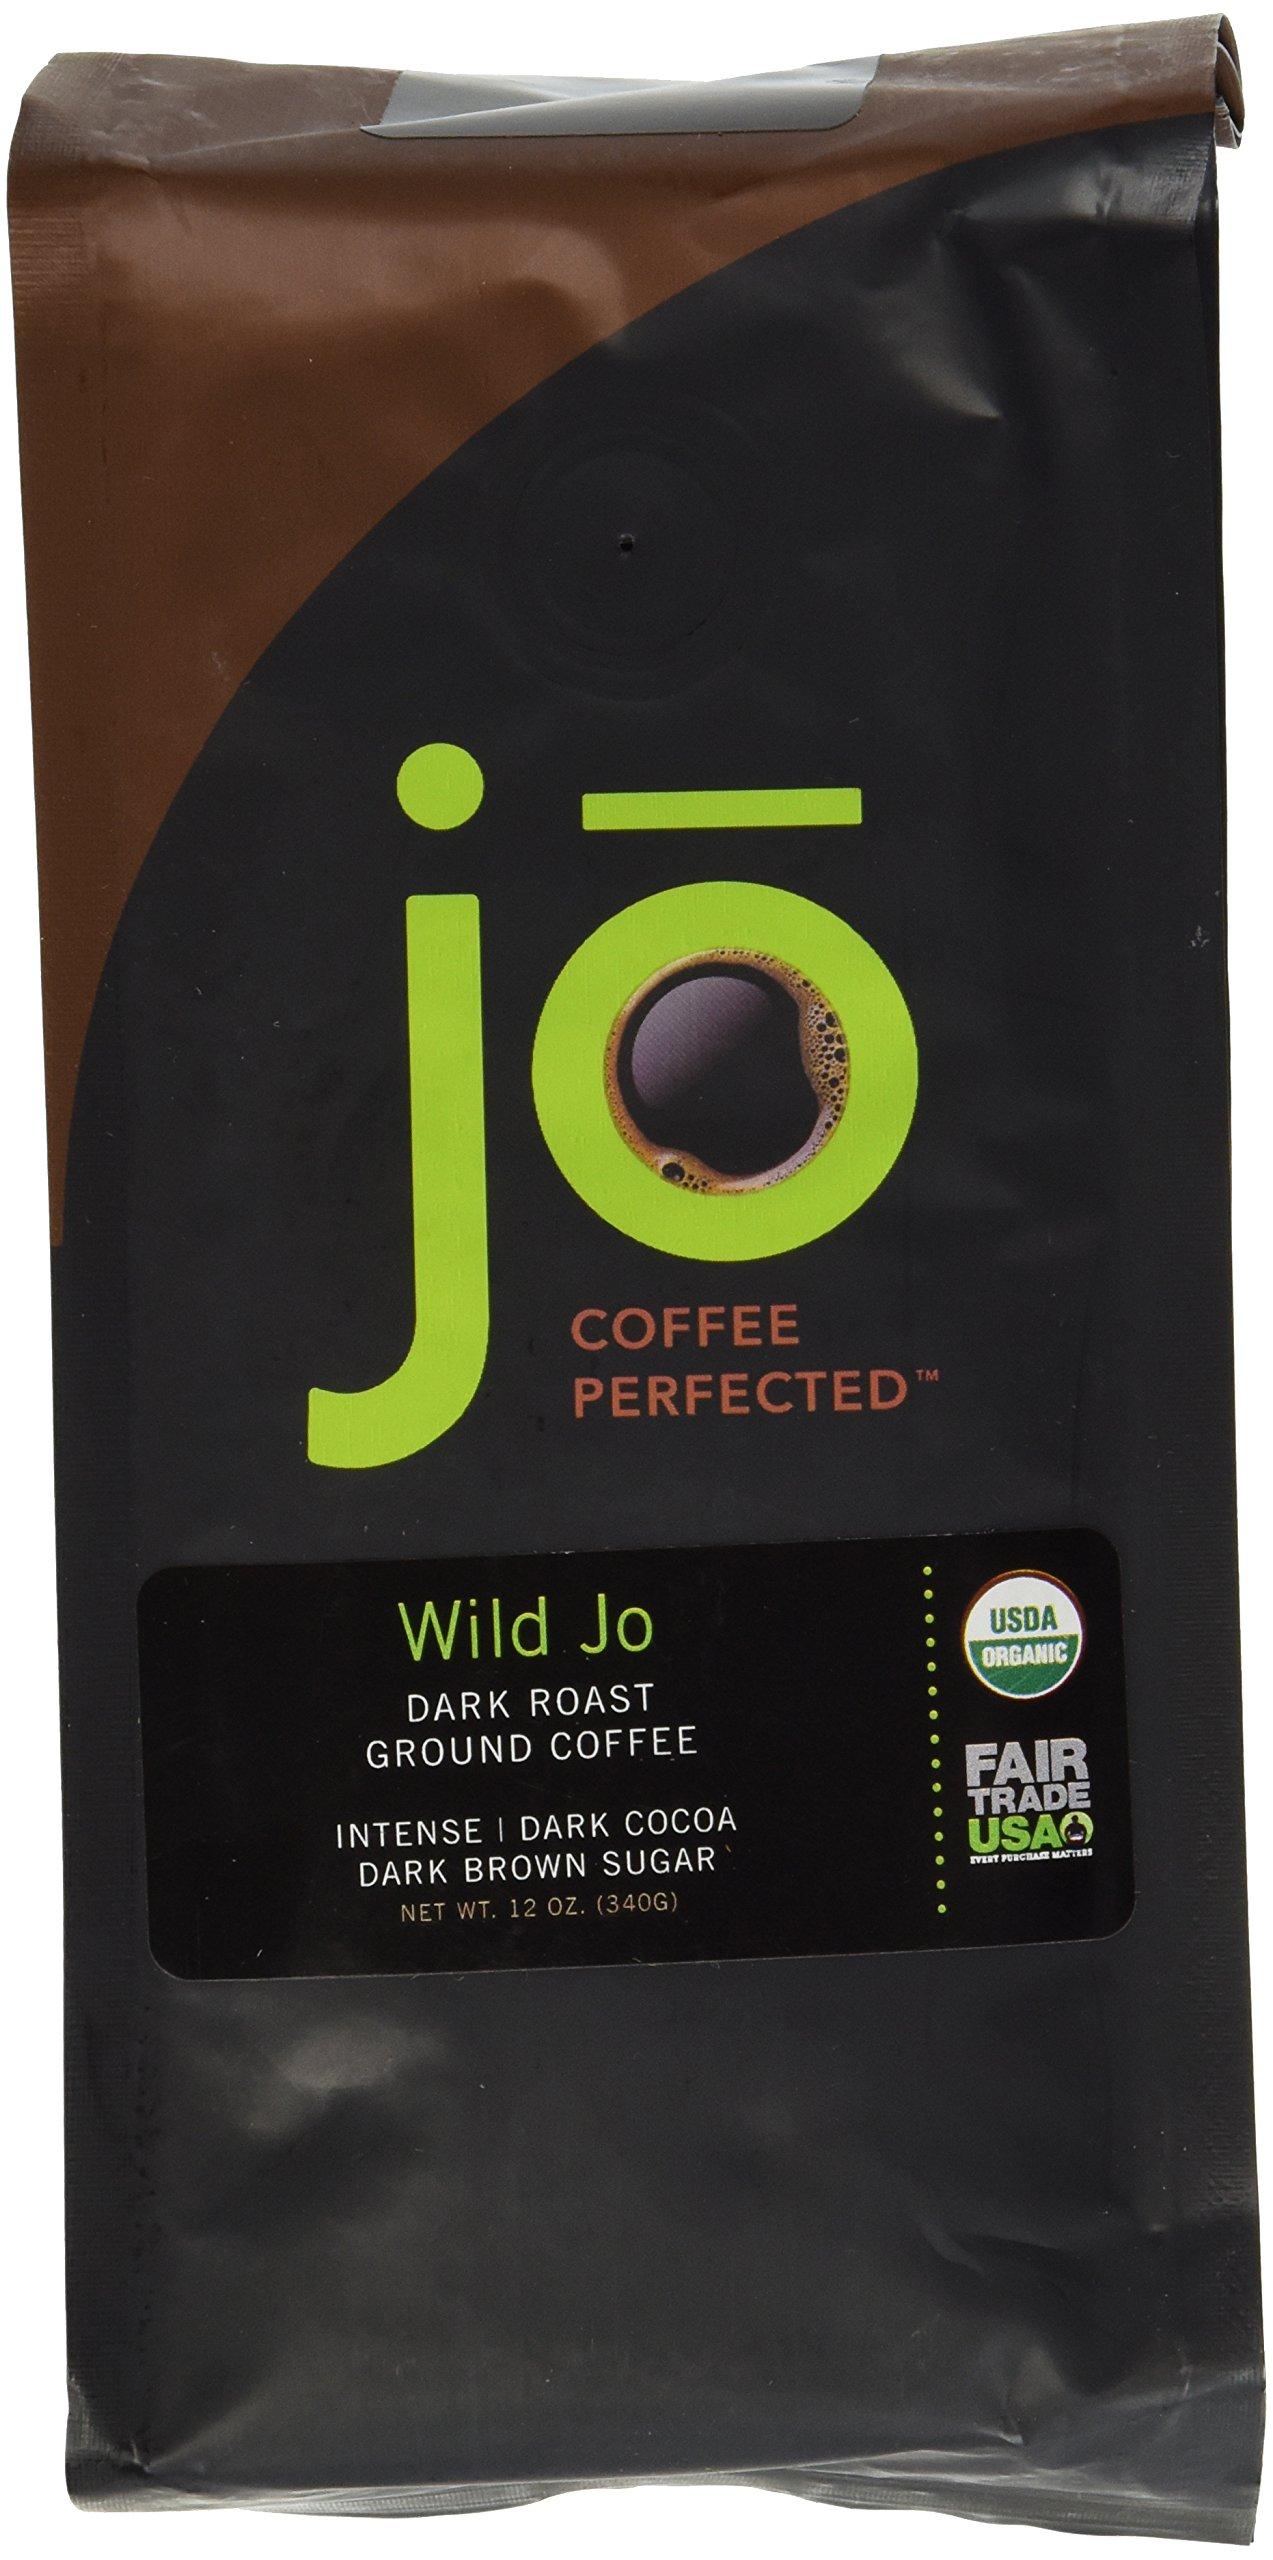 WILD JO: 12 oz, Dark French Roast Organic Coffee, Ground Coffee, Bold Strong Rich Wicked Good Coffee! Great Brewed or Cold Brew, USDA Certified Fair Trade Organic, 100% Arabica Coffee, NON-GMO